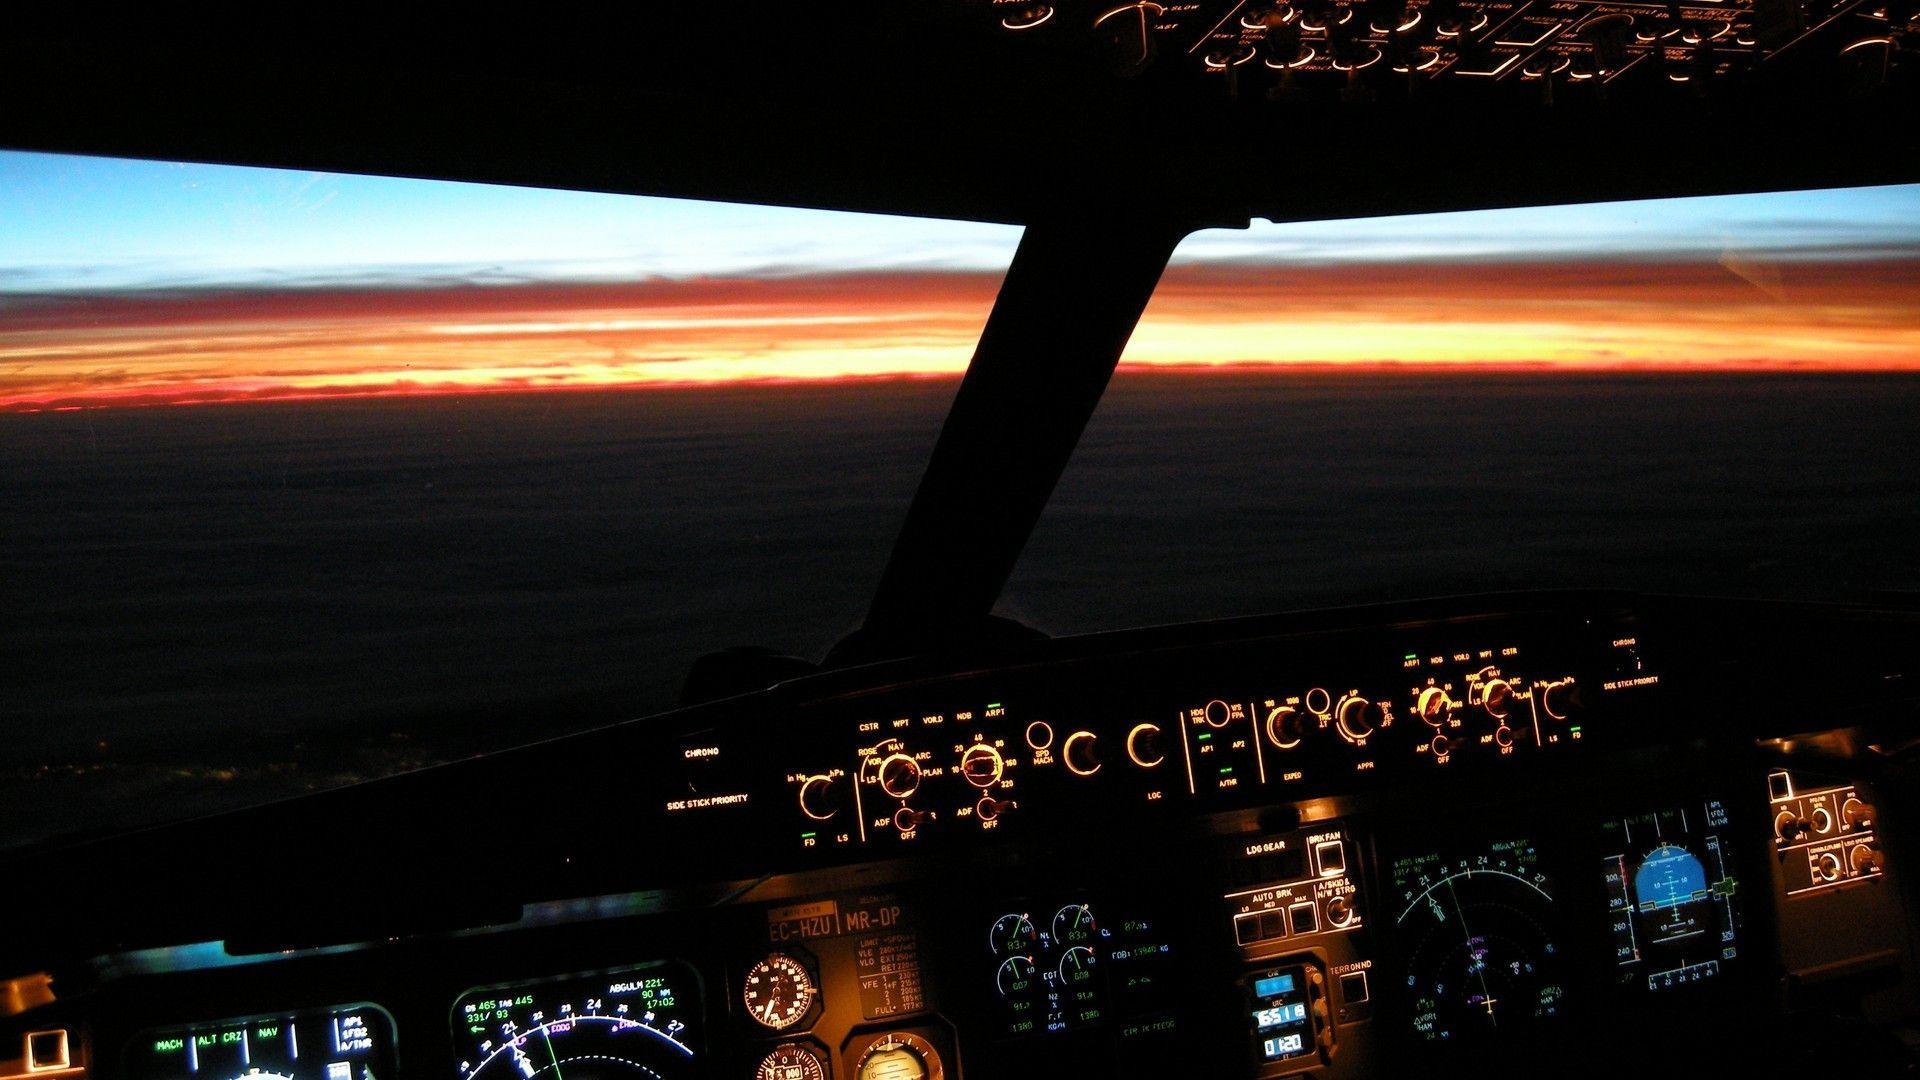 1920x1080 Airbus Cockpit Beleuchtet Sunset Wallpaper Allwallpaper Airbus A380 Cockpit Cockpit Airbus